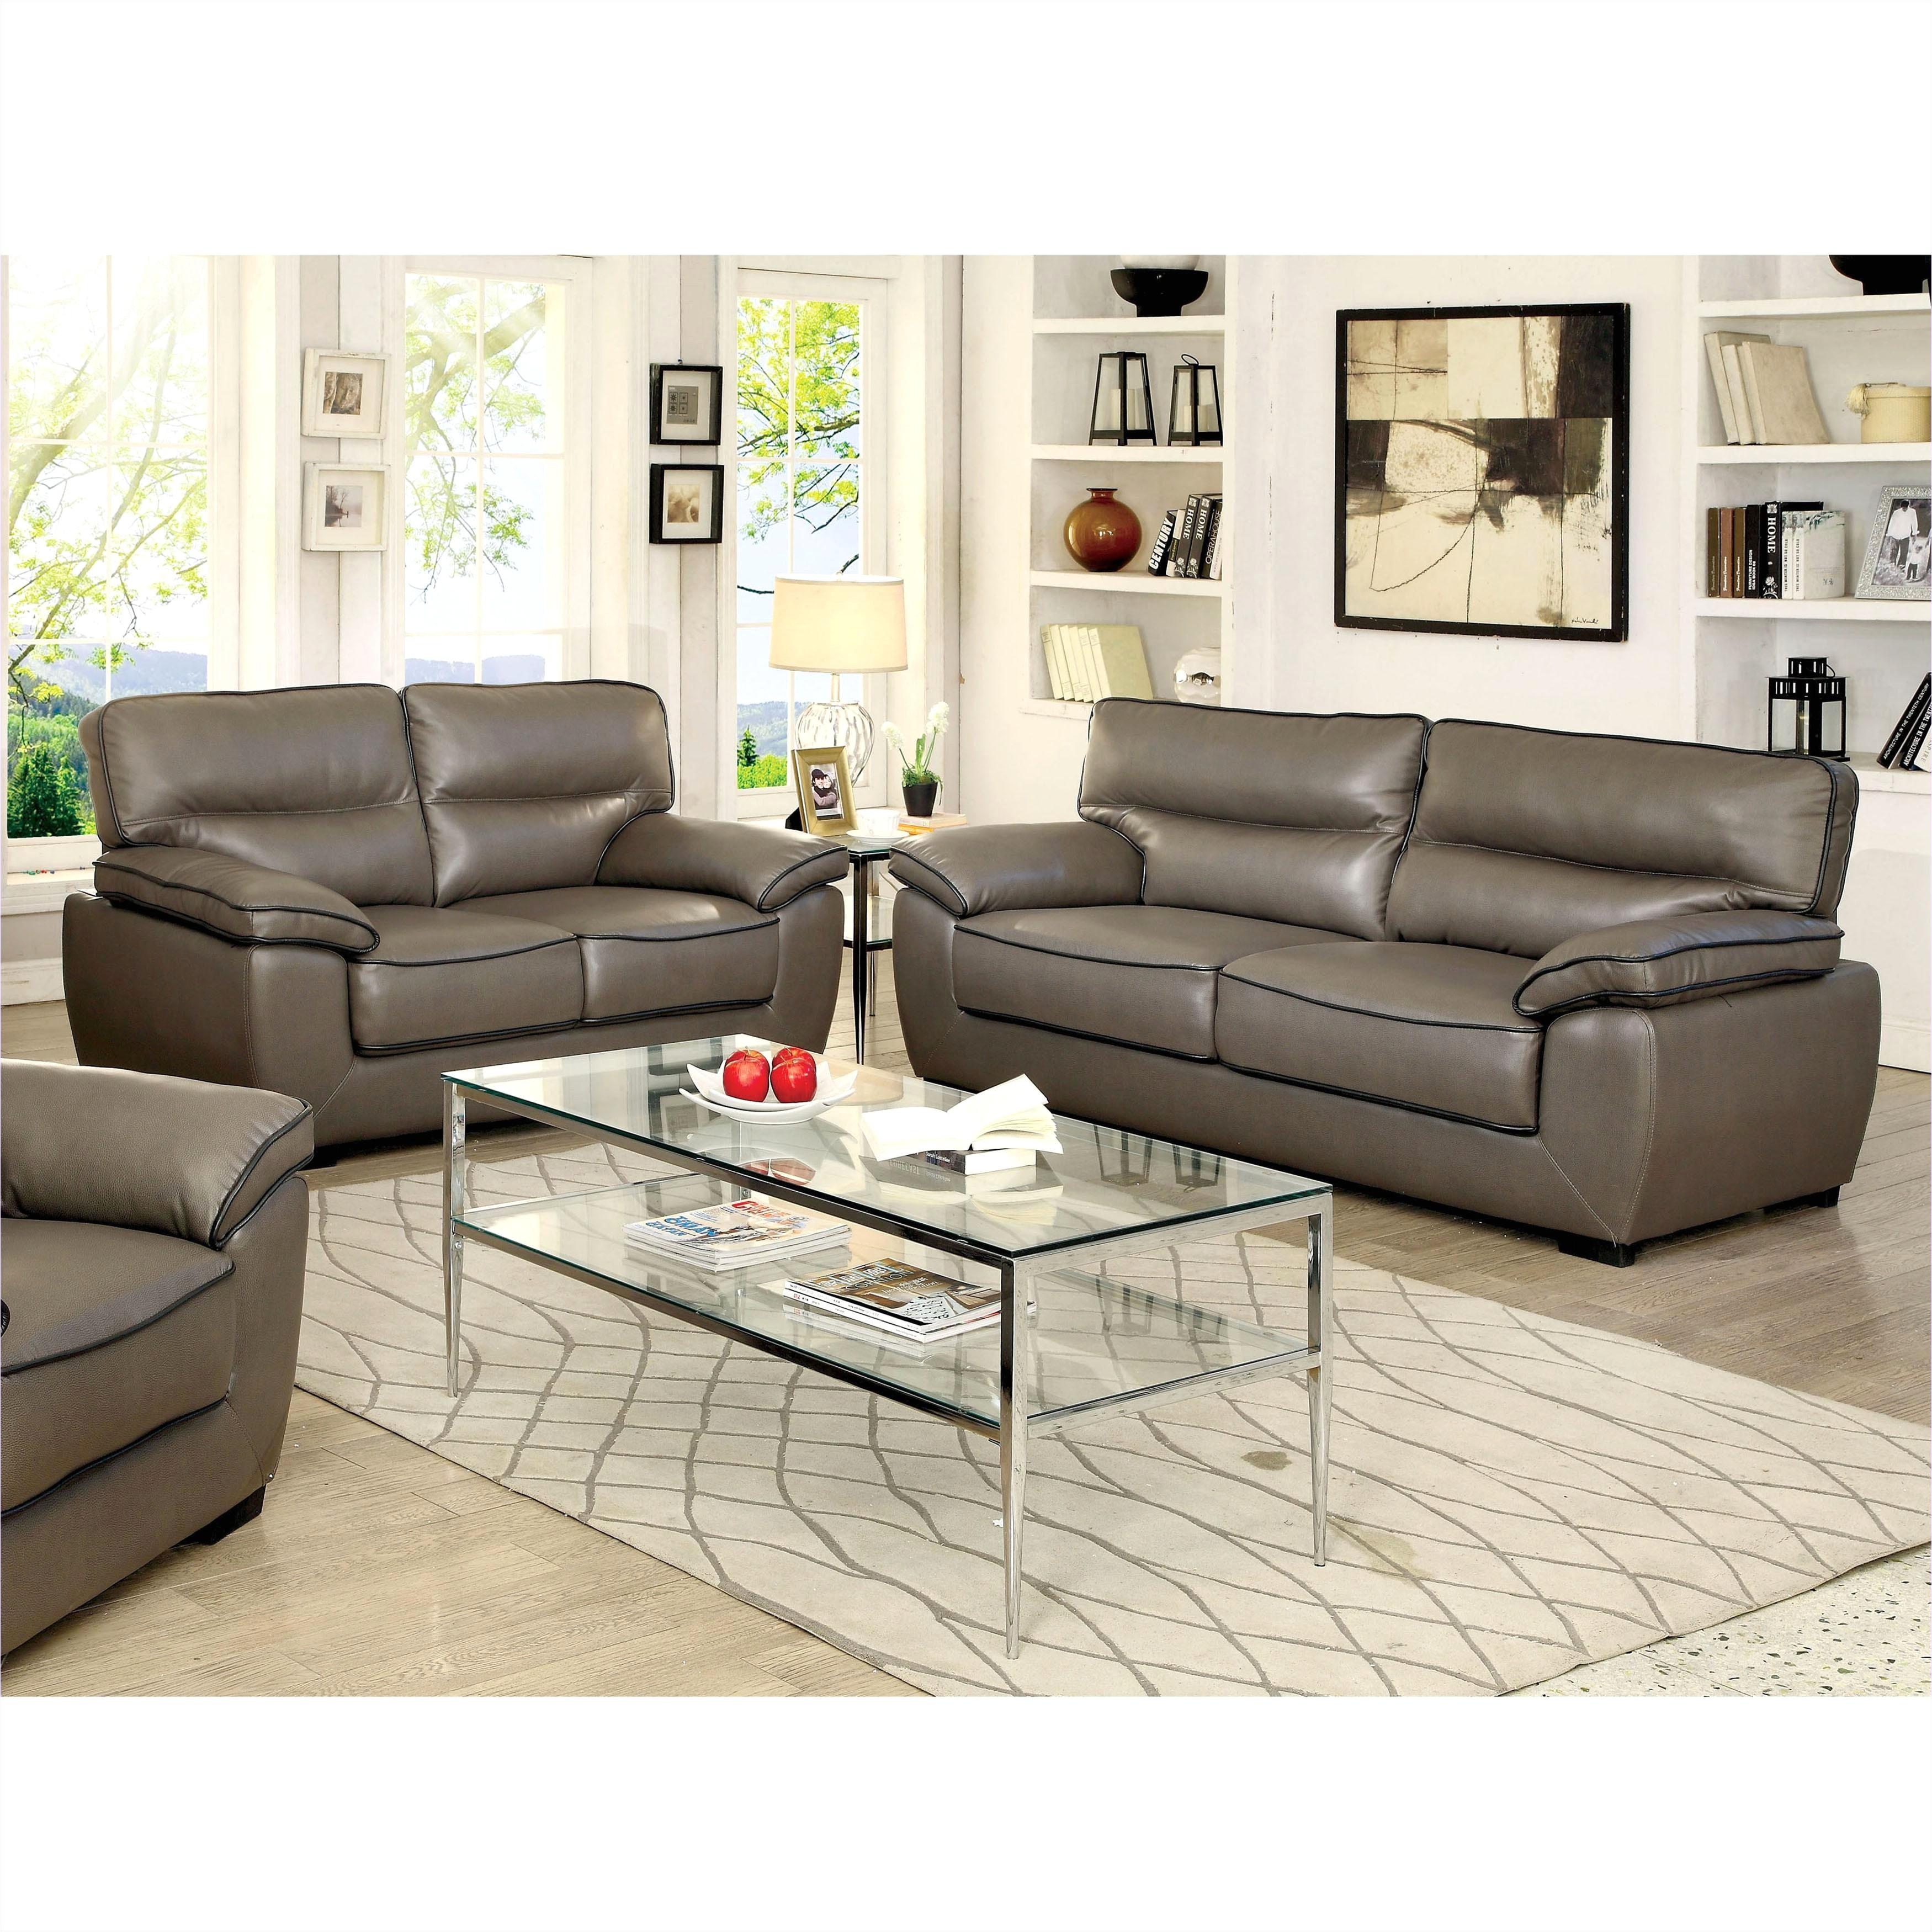 small sofas for small spaces awesome taras zdj a a cie od ikea taras